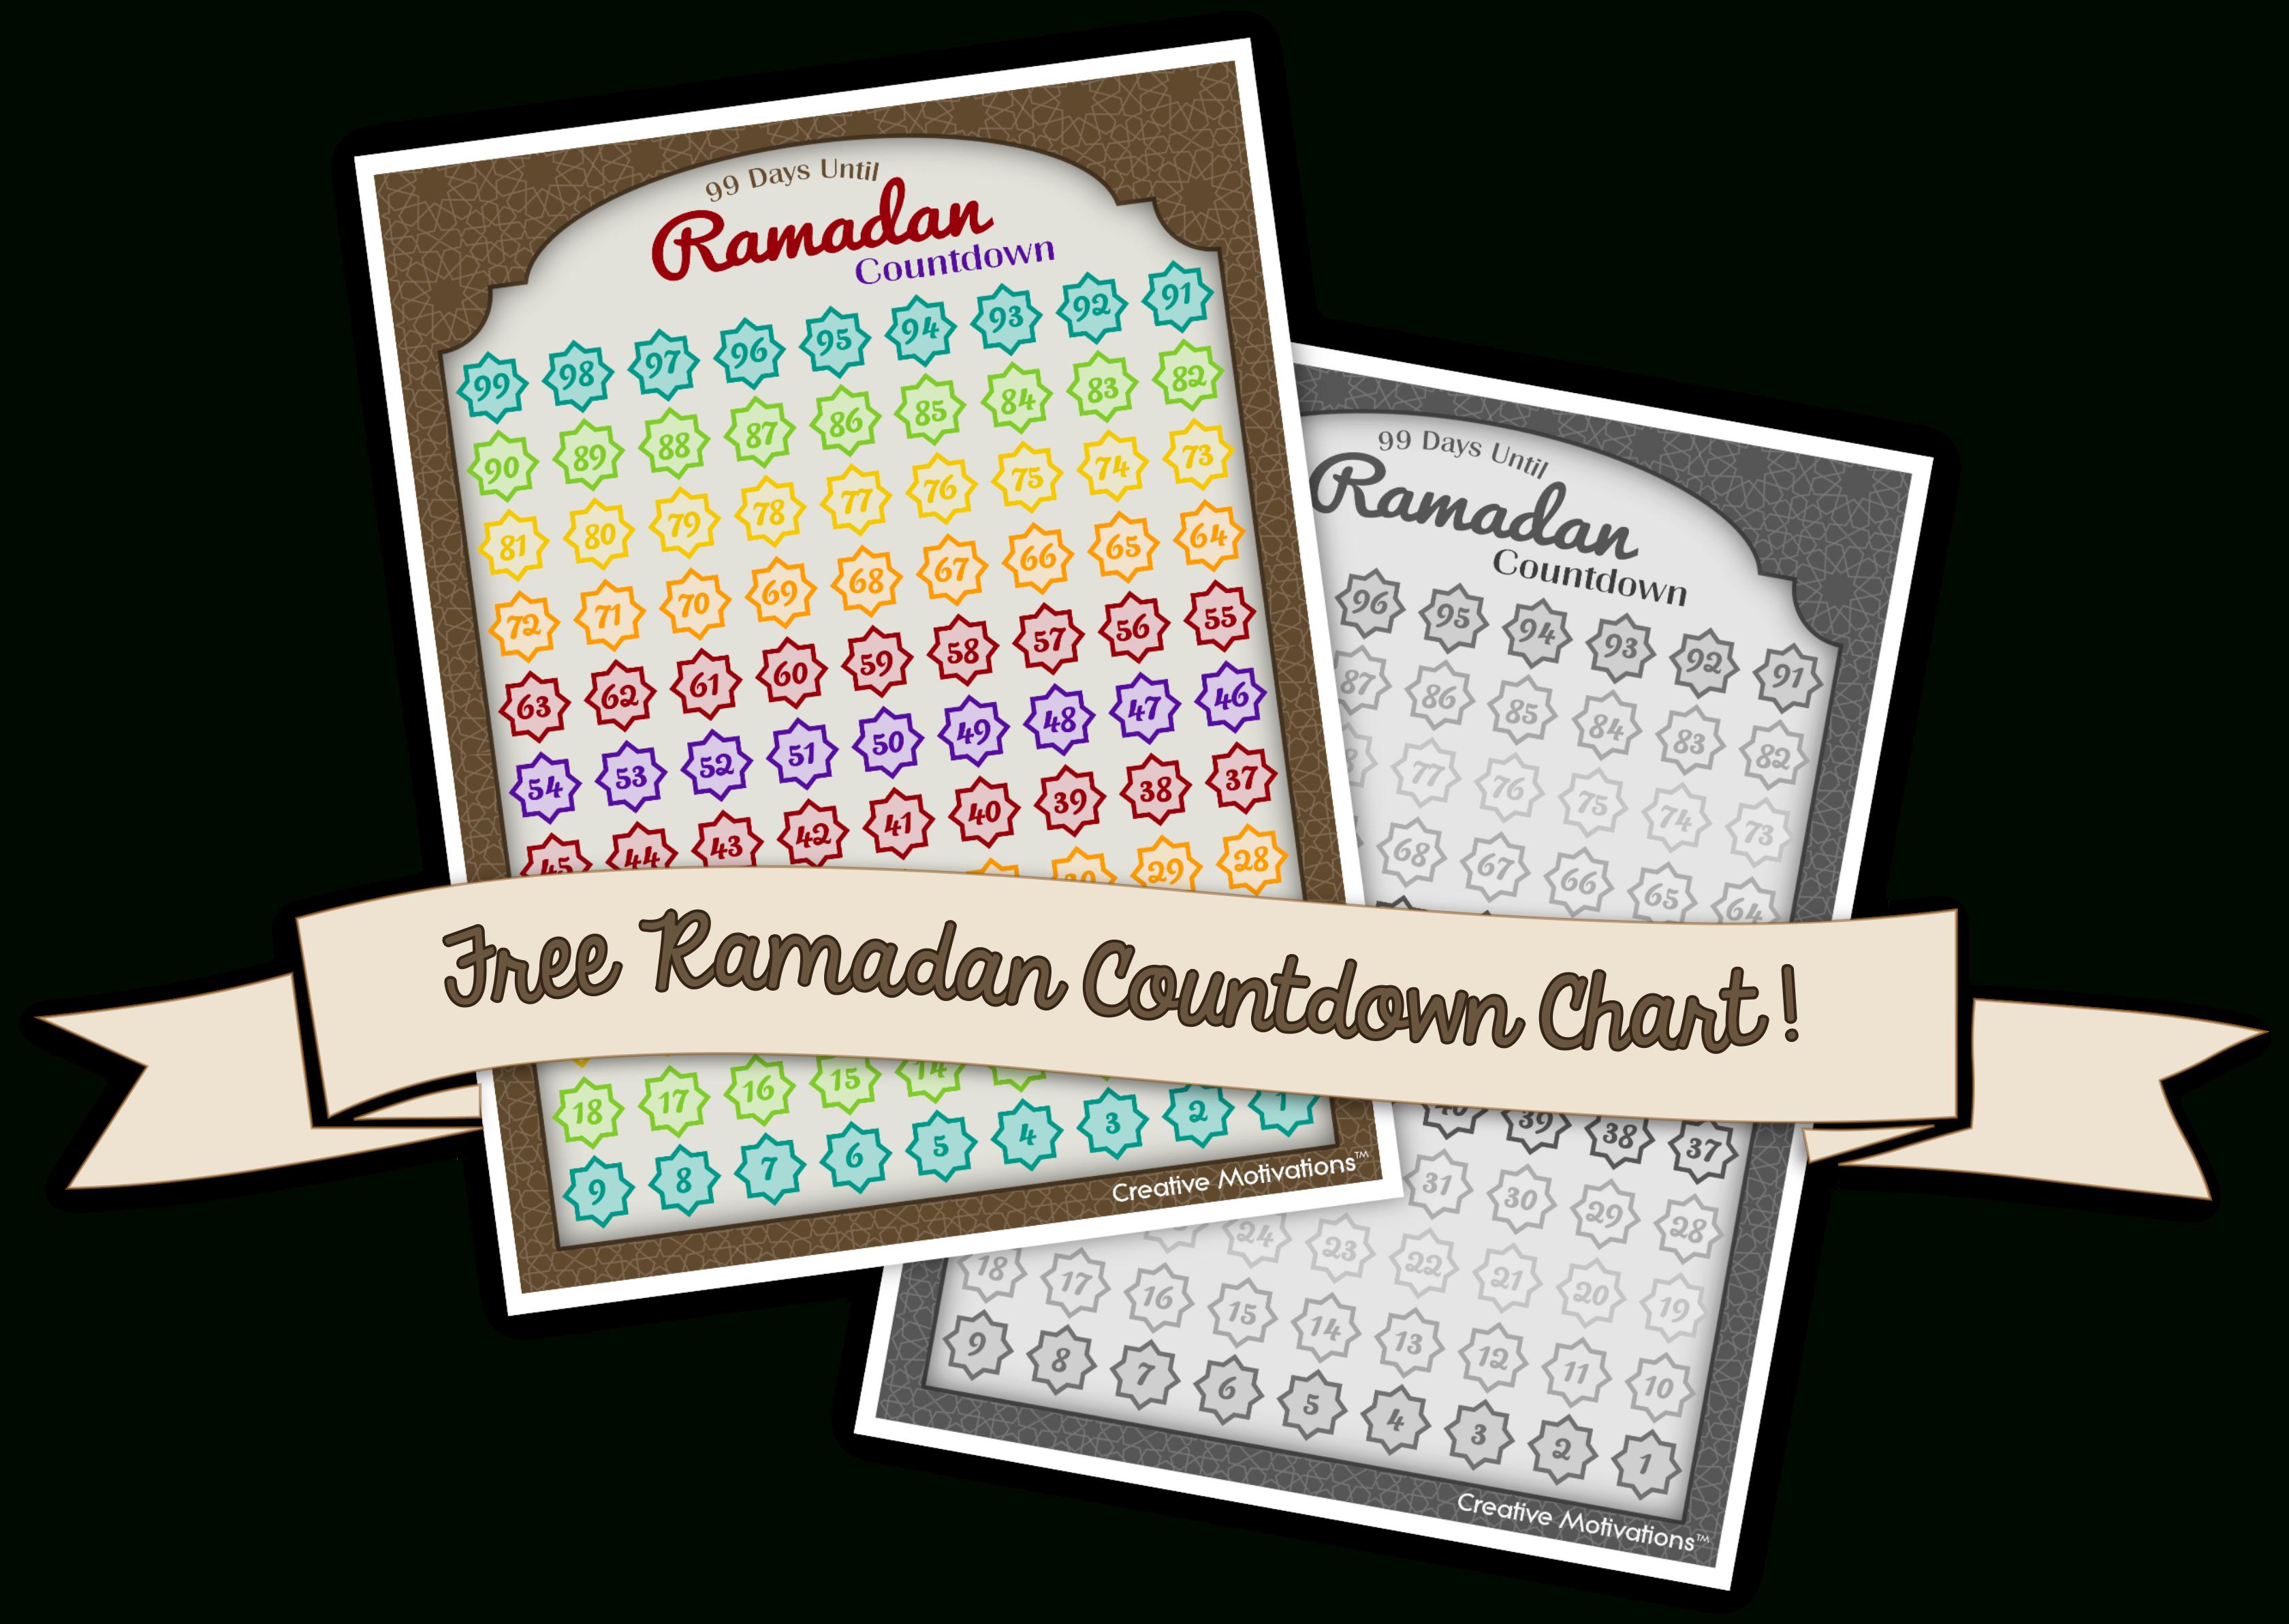 Free Printable: 99 Days Til Ramadan Countdown Chart